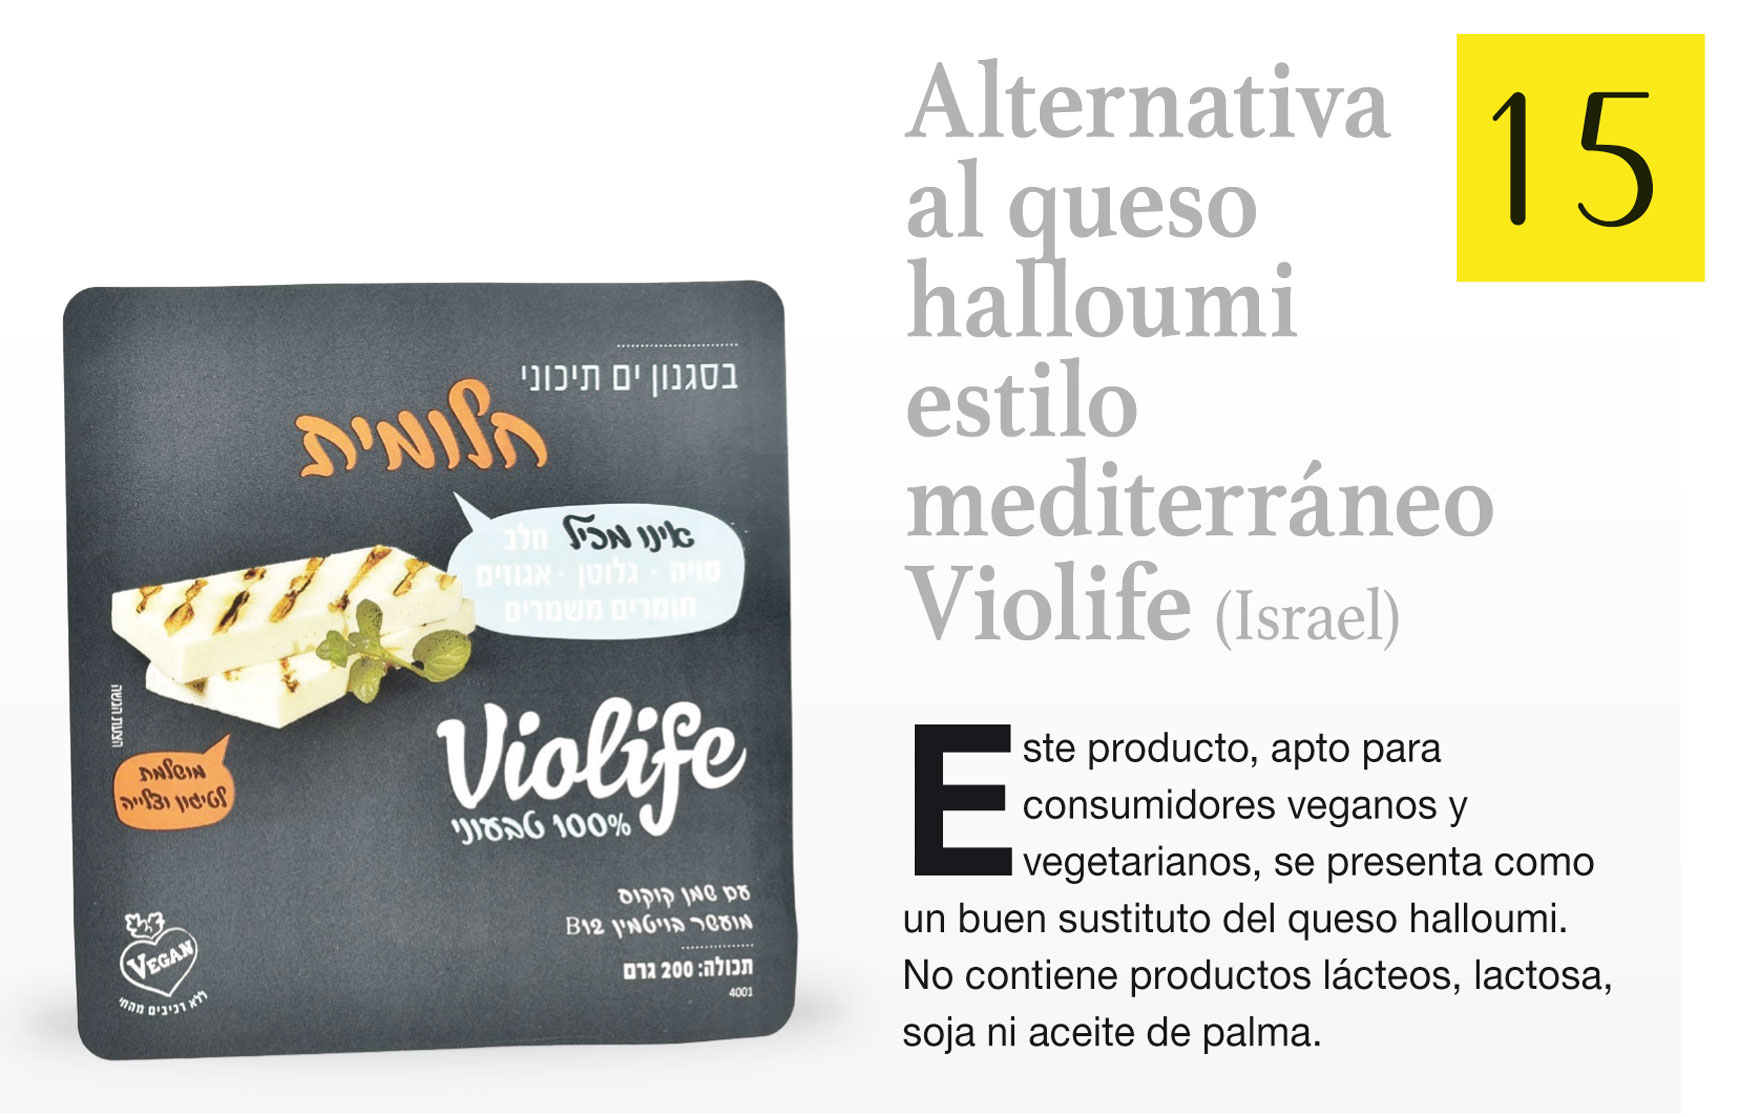 Alternativa al queso halloumi estilo mediterráneo Violife (Israel)